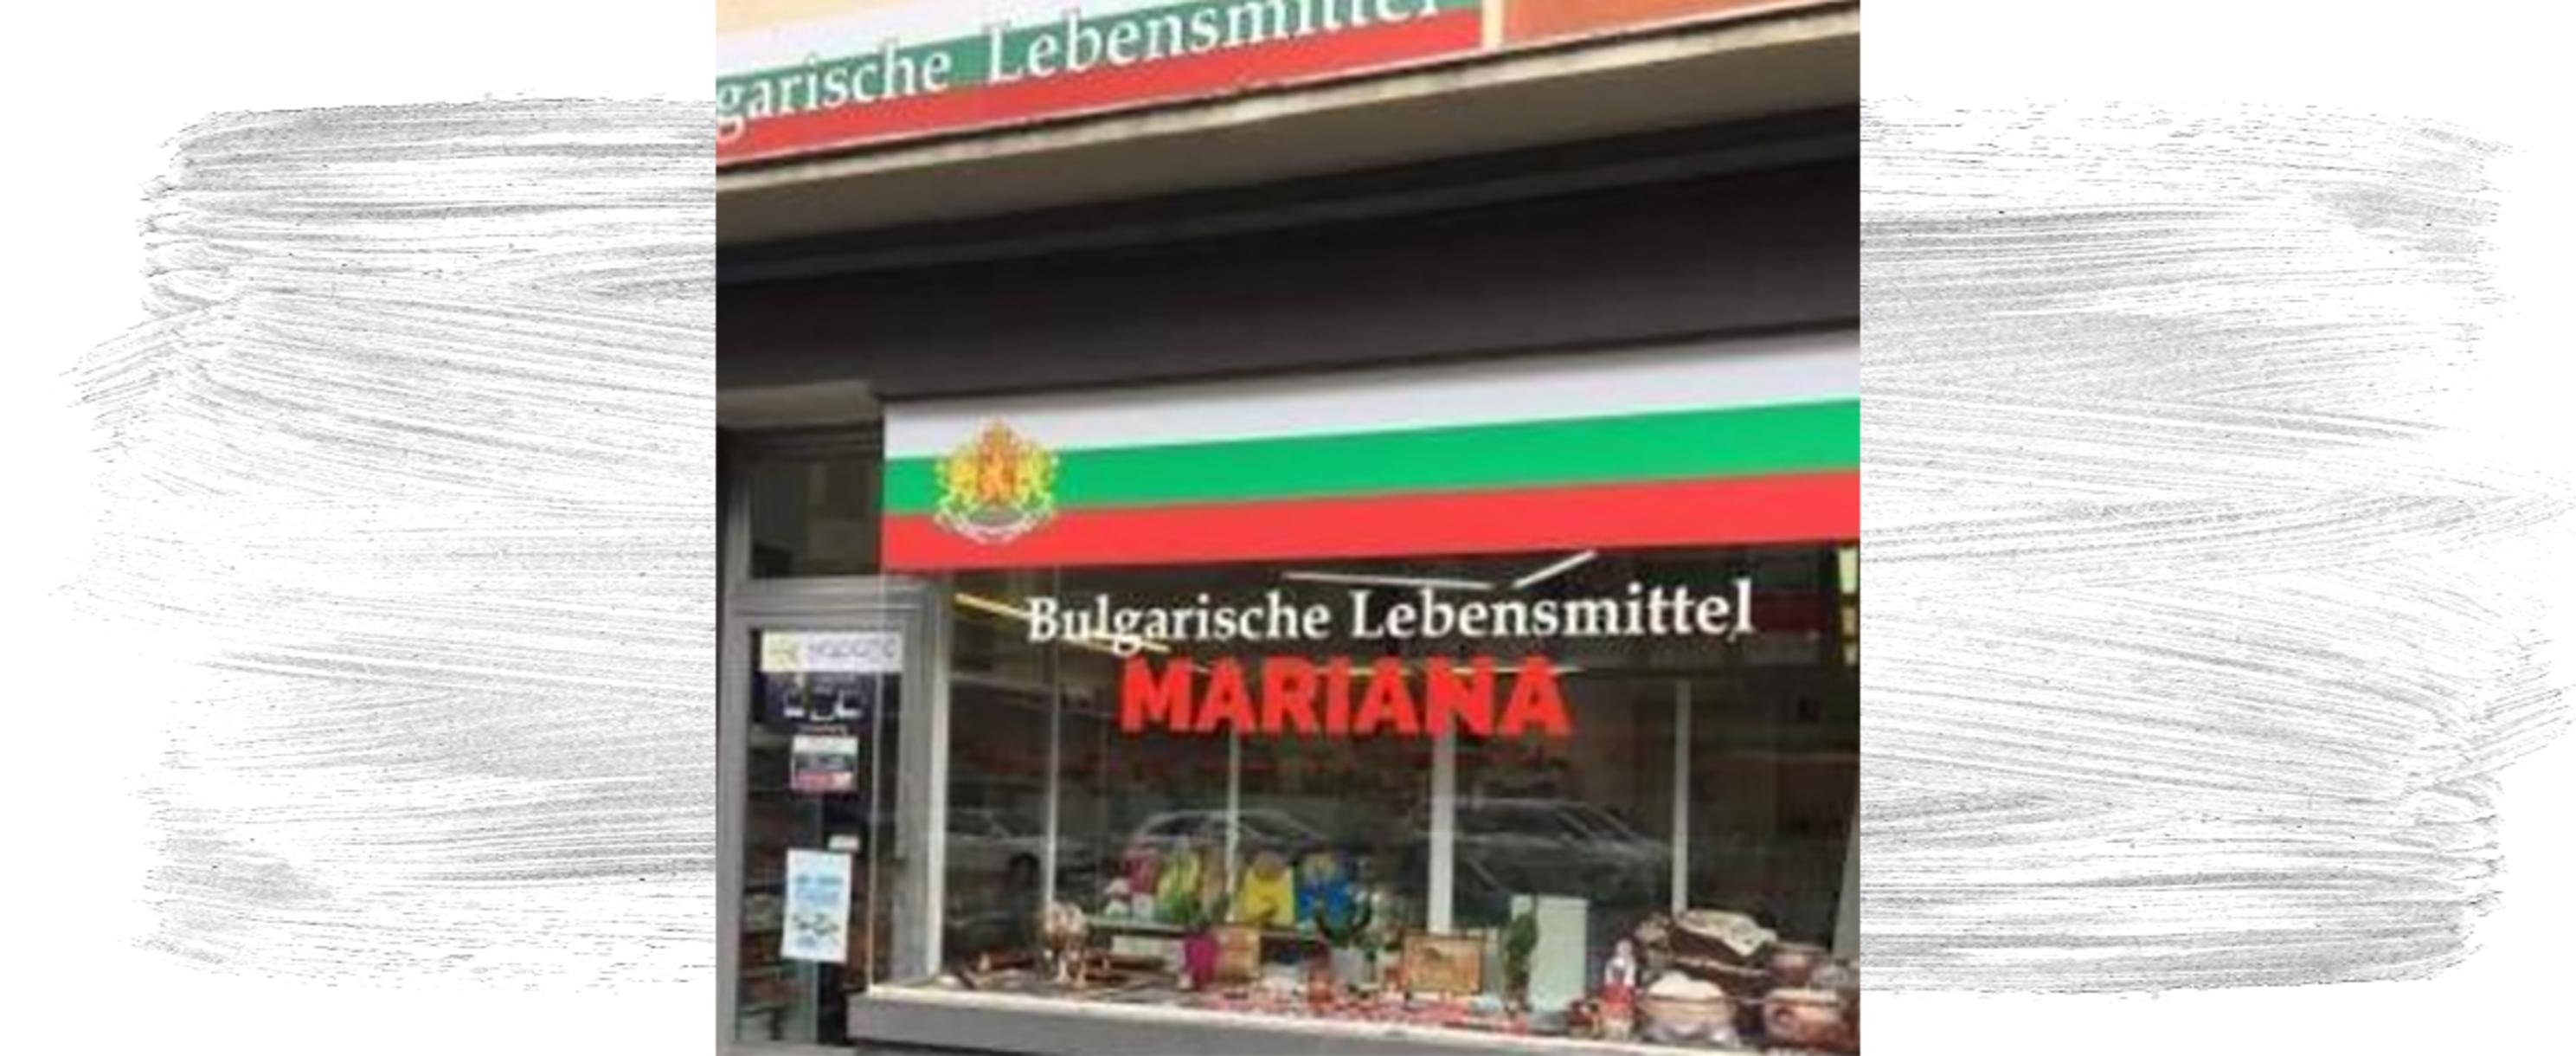 bulgarian supermarket  nuernberg ortel mobile ortel